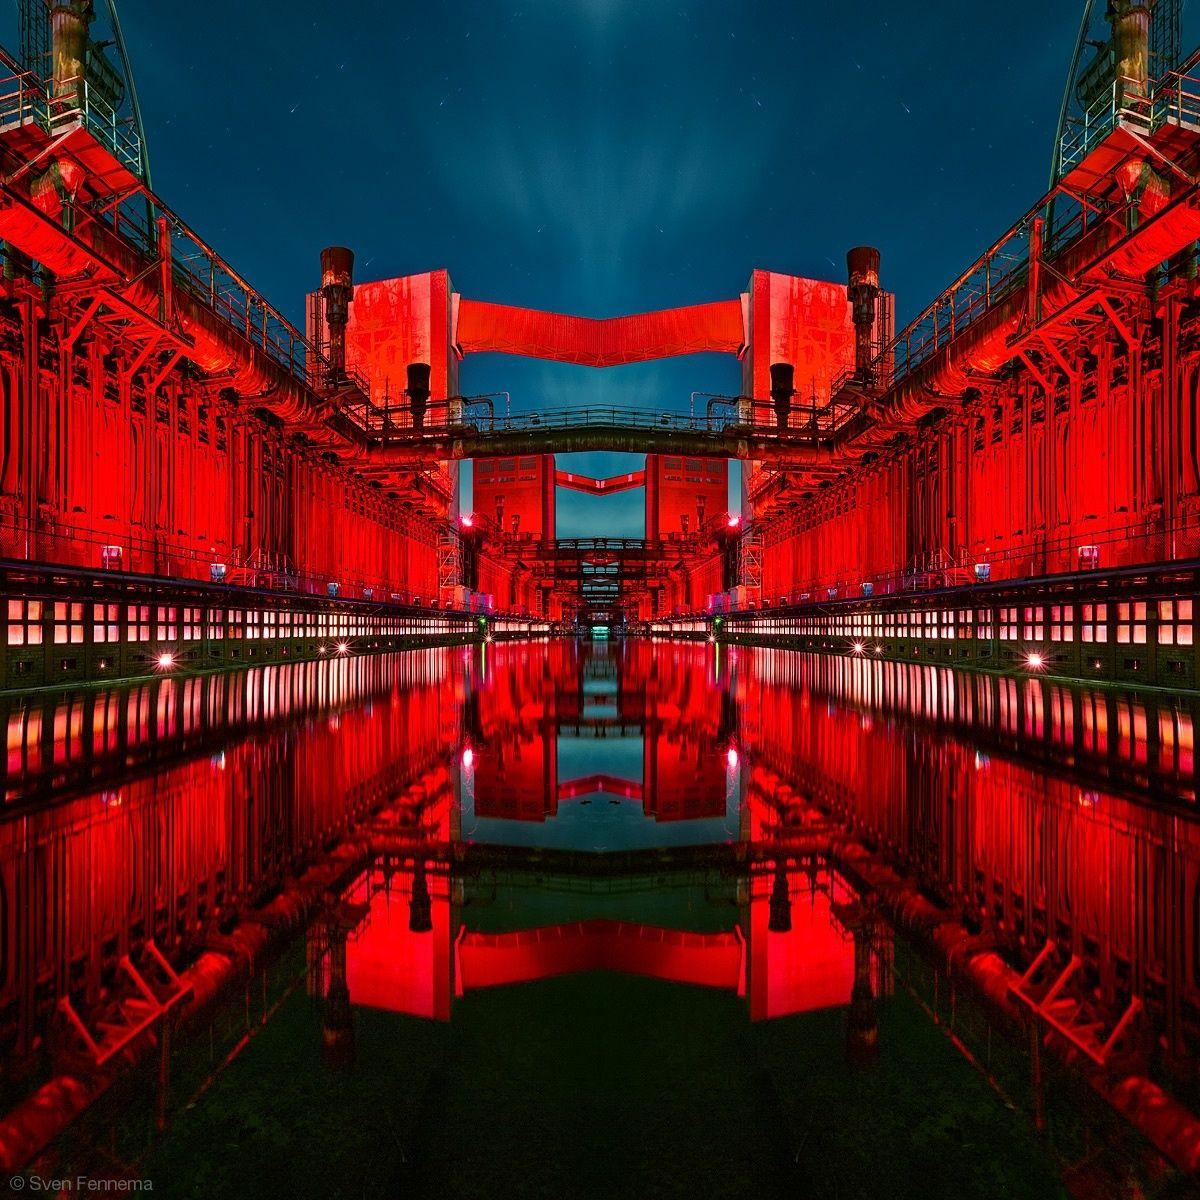 1X - nightline by Sven Fennema